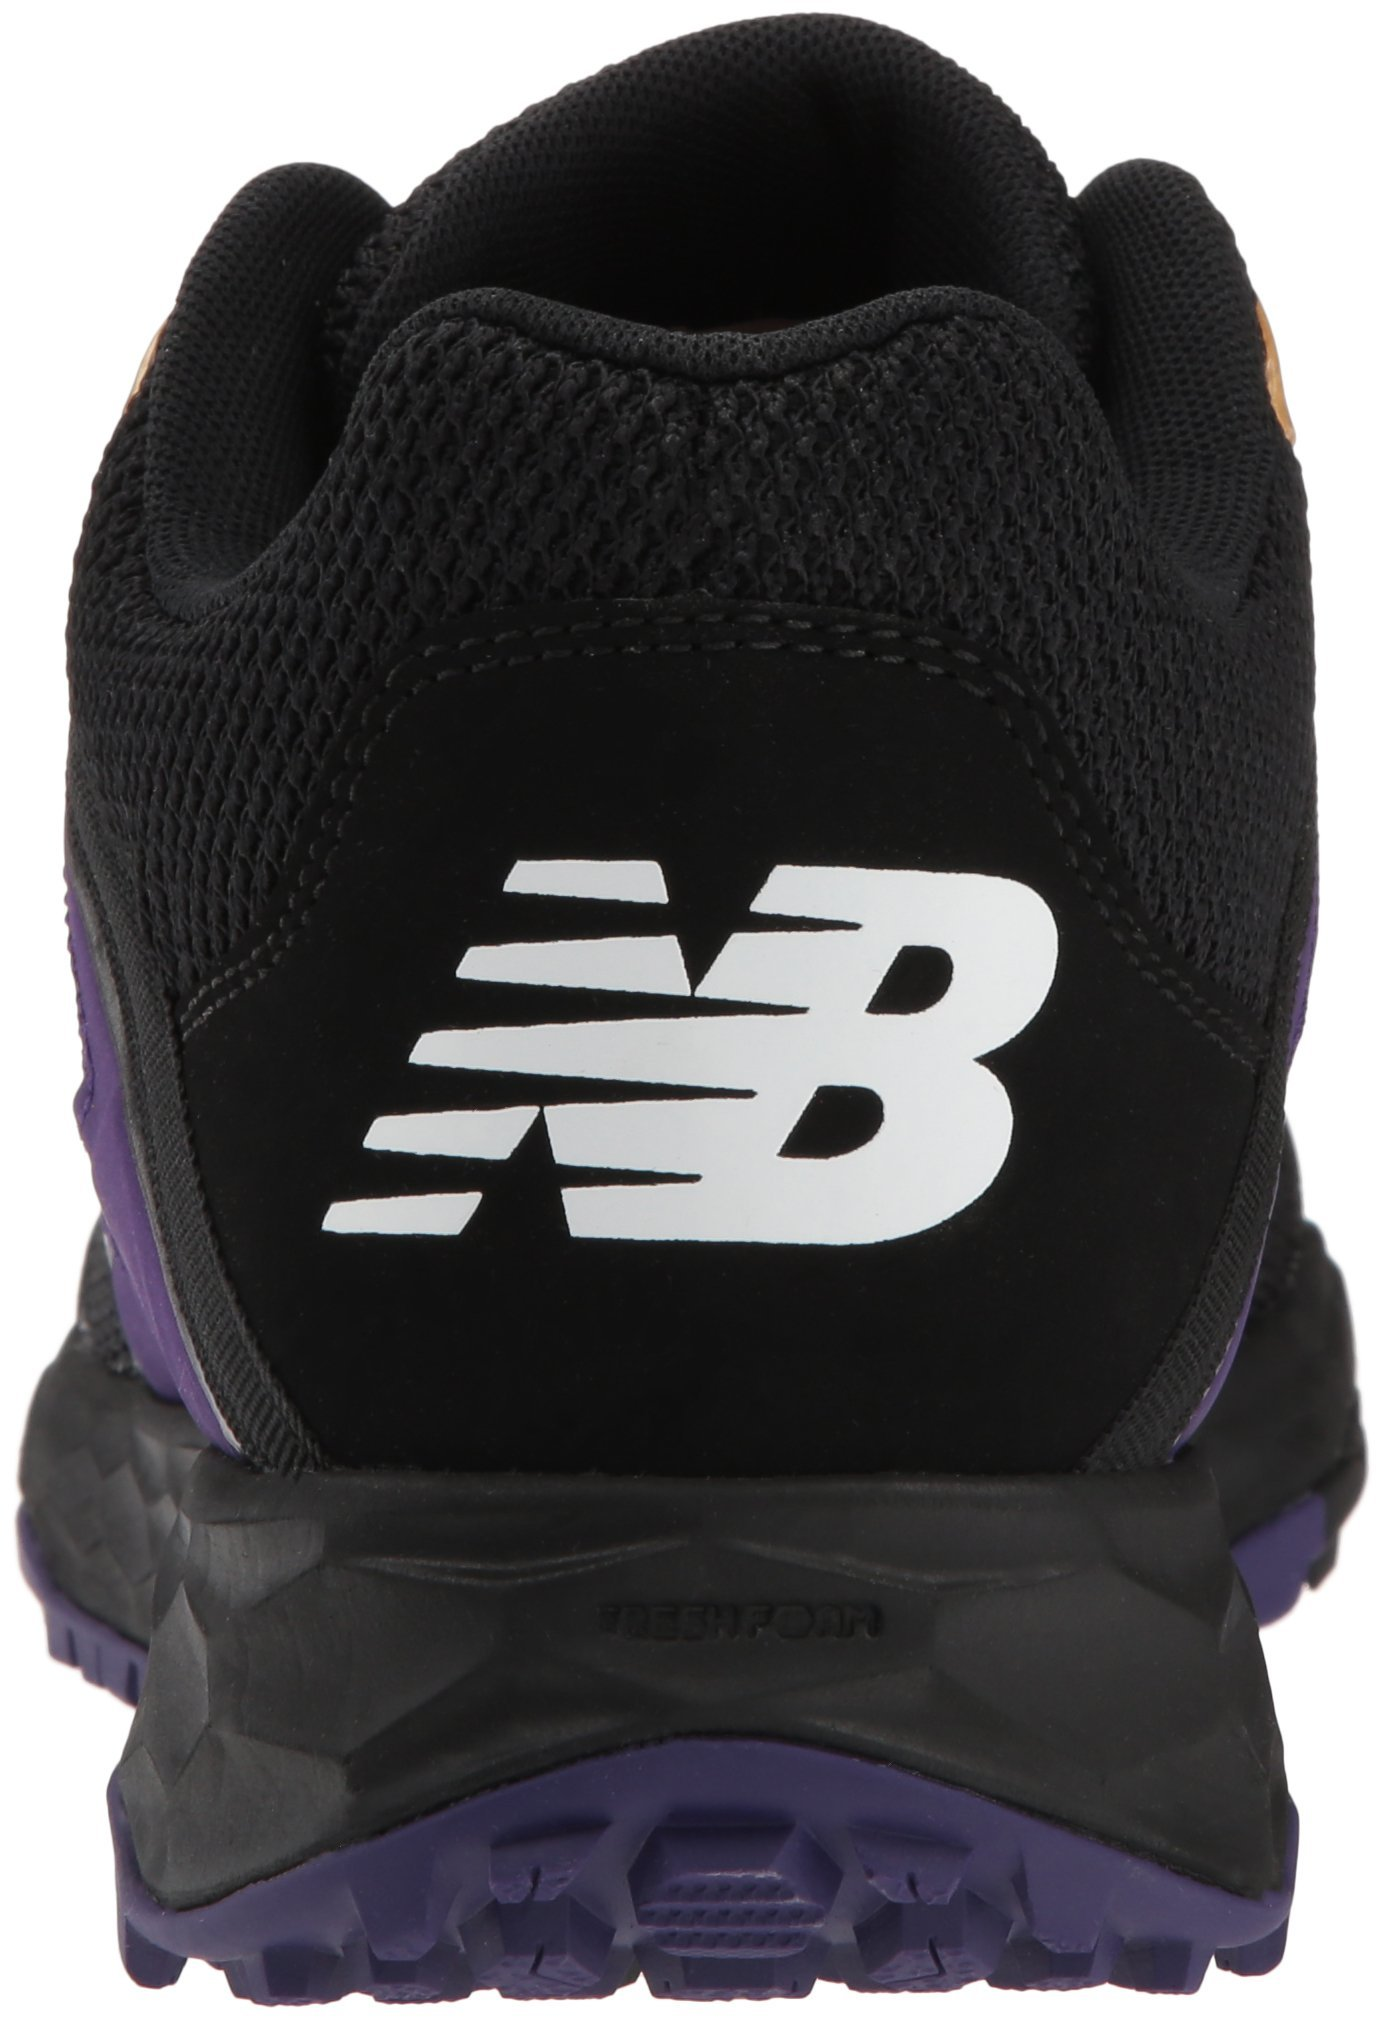 New Balance Men's 3000v4 Turf Baseball Shoe, Black/Purple, 5 D US by New Balance (Image #2)